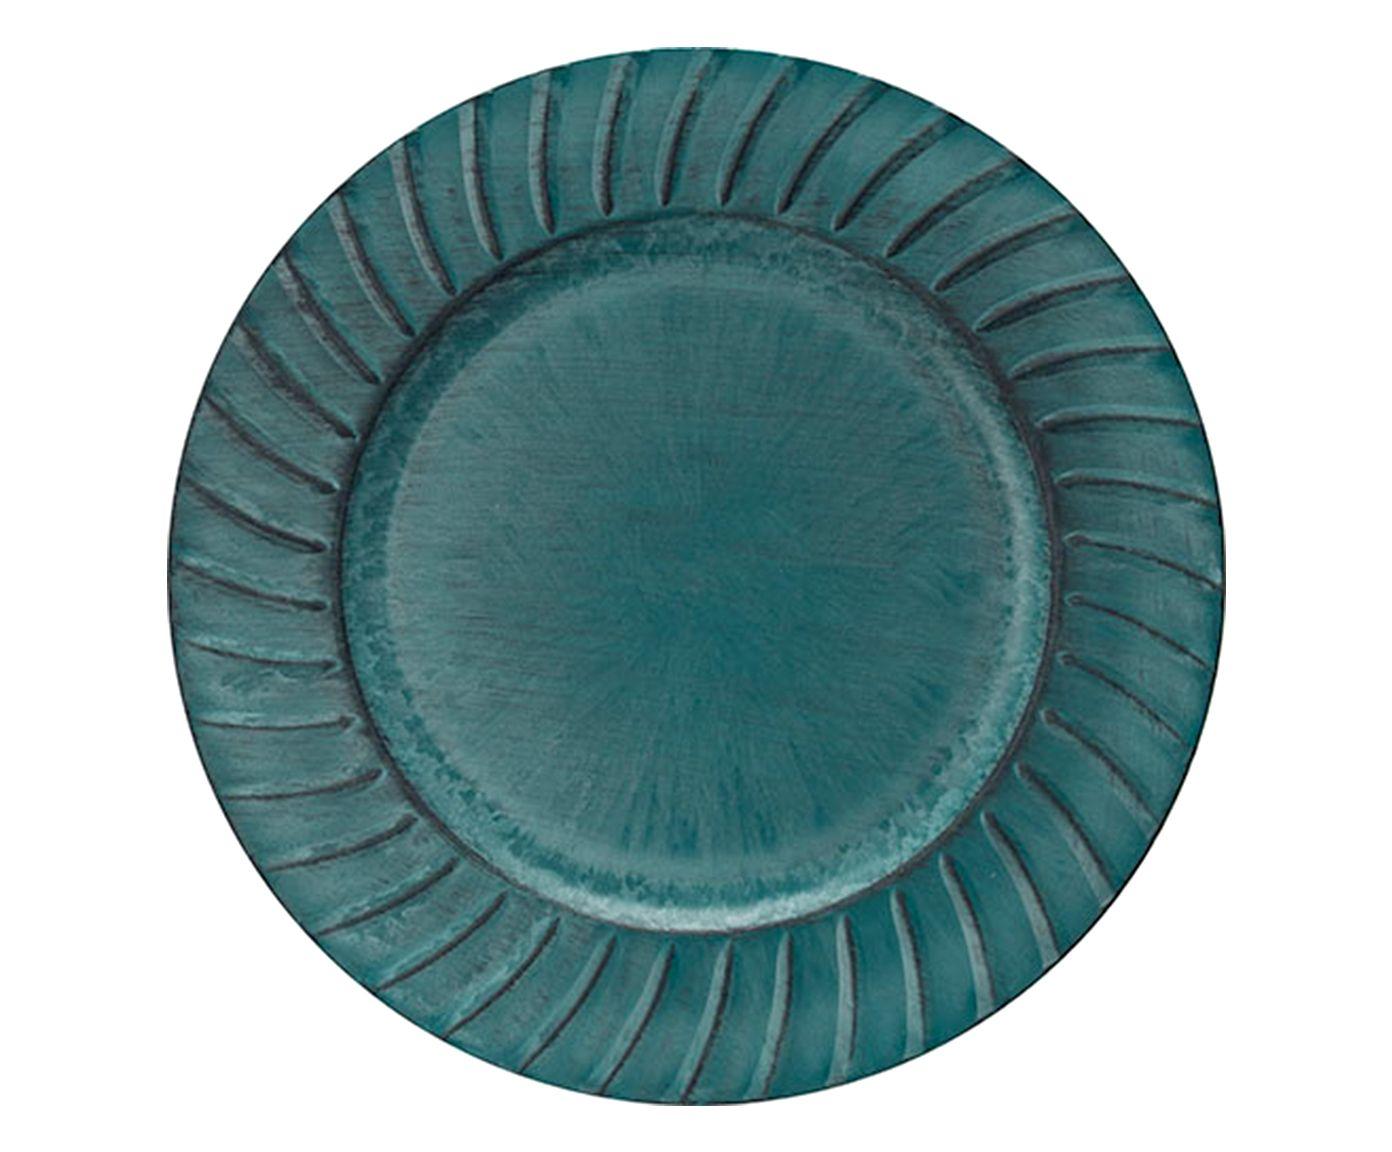 Sousplat Dorico Green - 33cm | Westwing.com.br